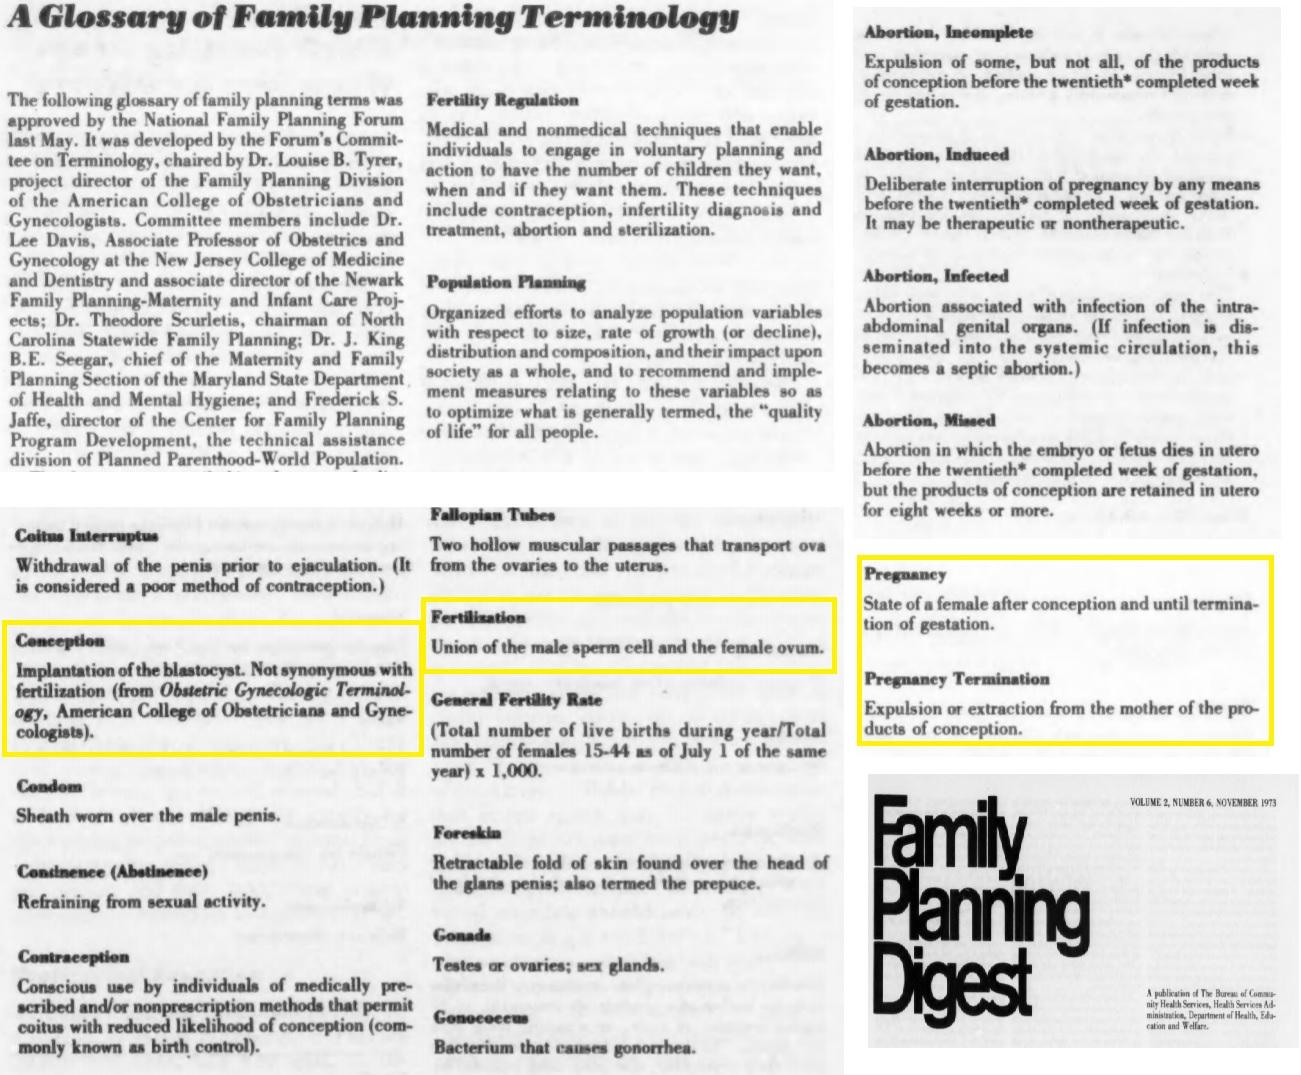 Family Planning Digest terminology abortion concenption pregnancy implantation Nov 1973 and ACOG involvement